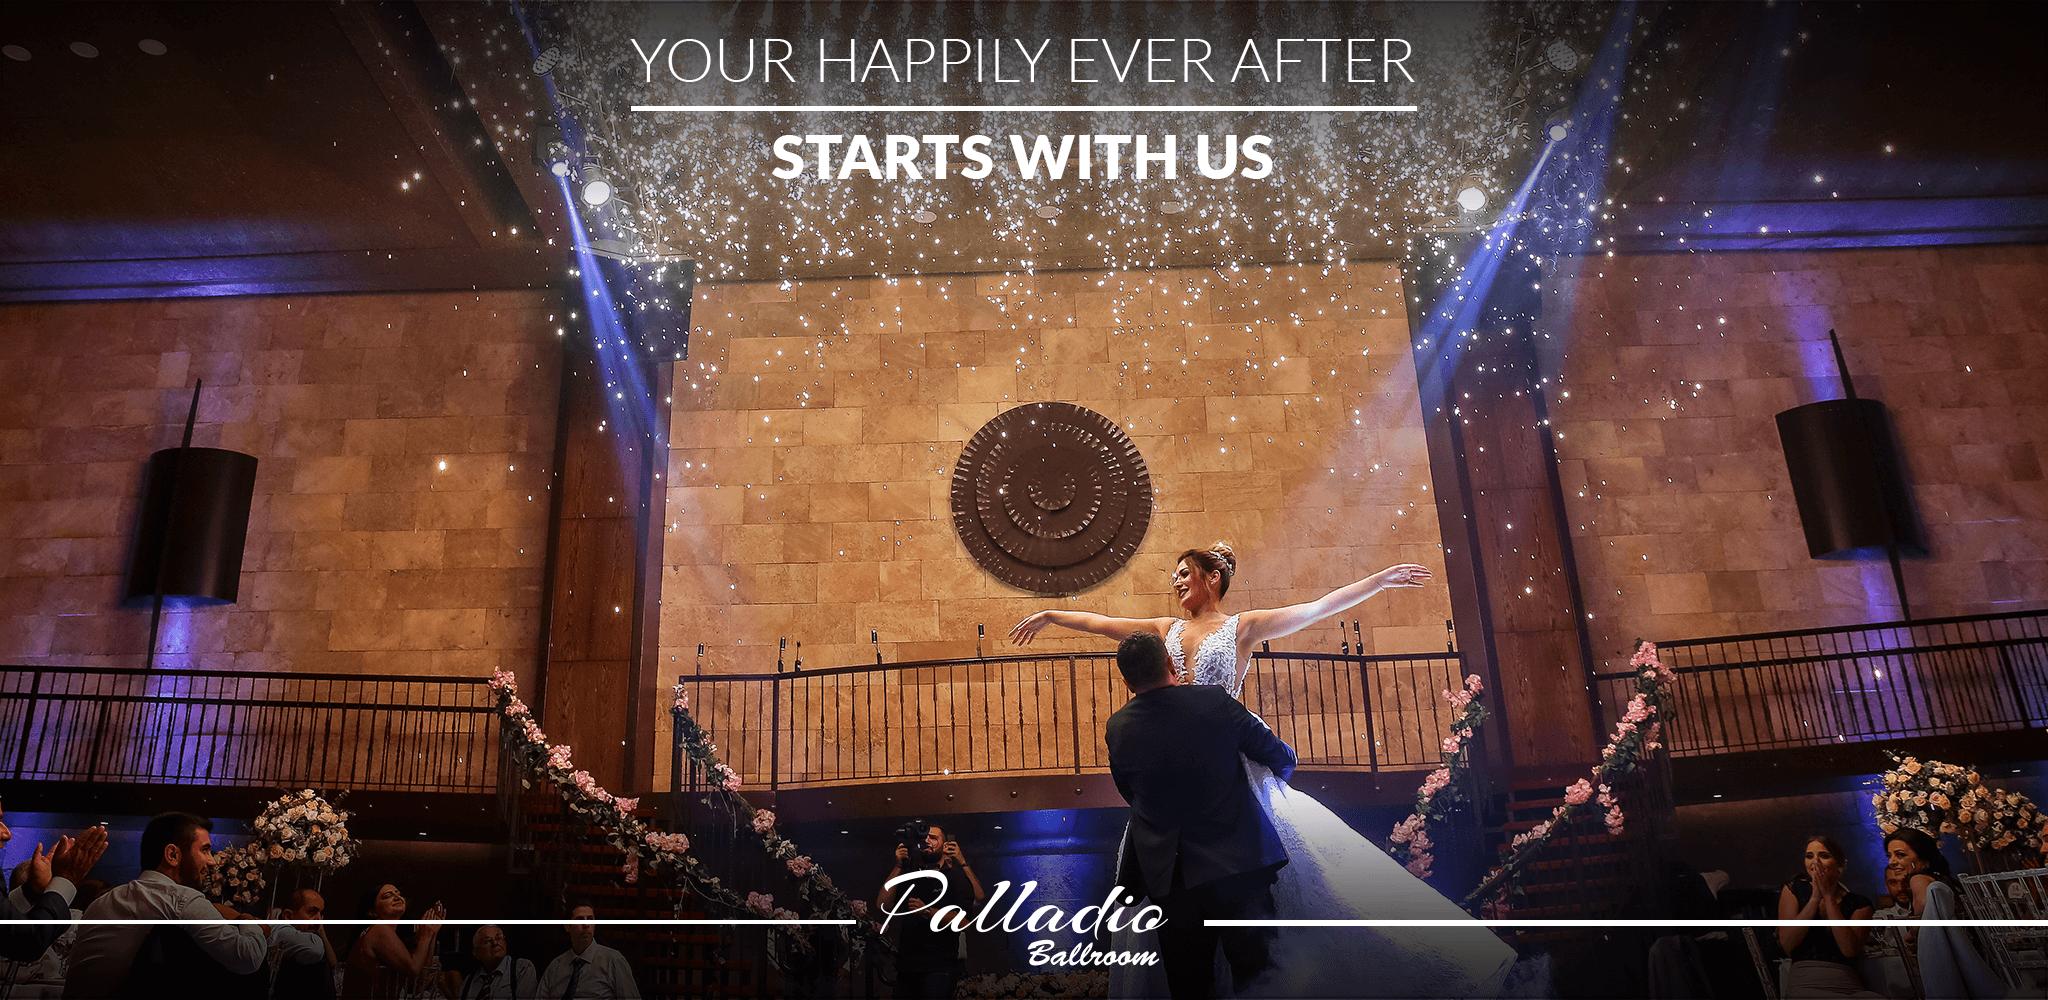 Palladio Ballroom your indoor wedding and event venue in jounieh Lebanon.